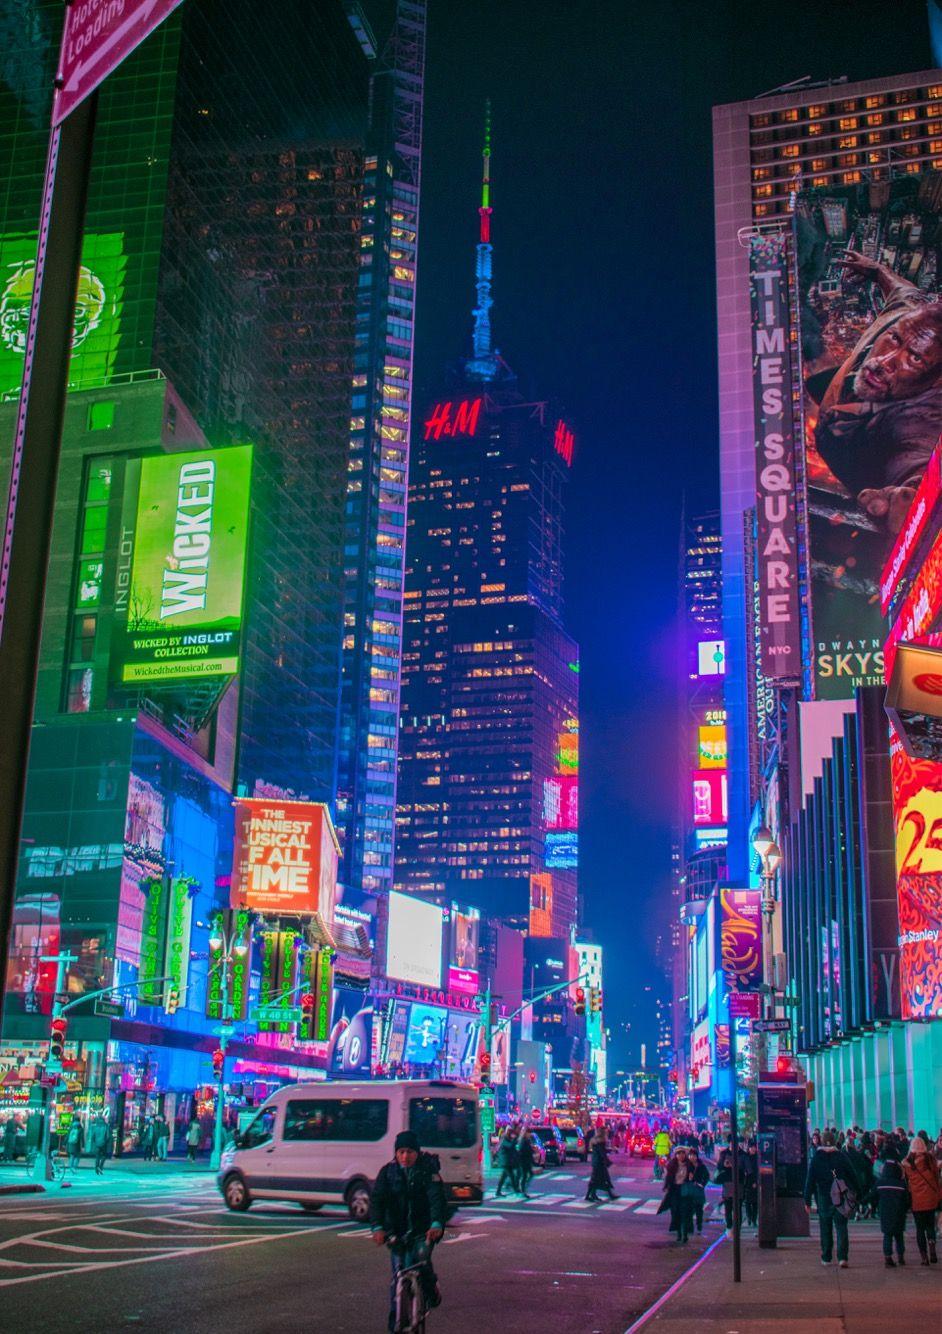 New York City Times Square, Photo by Jamie Kollman